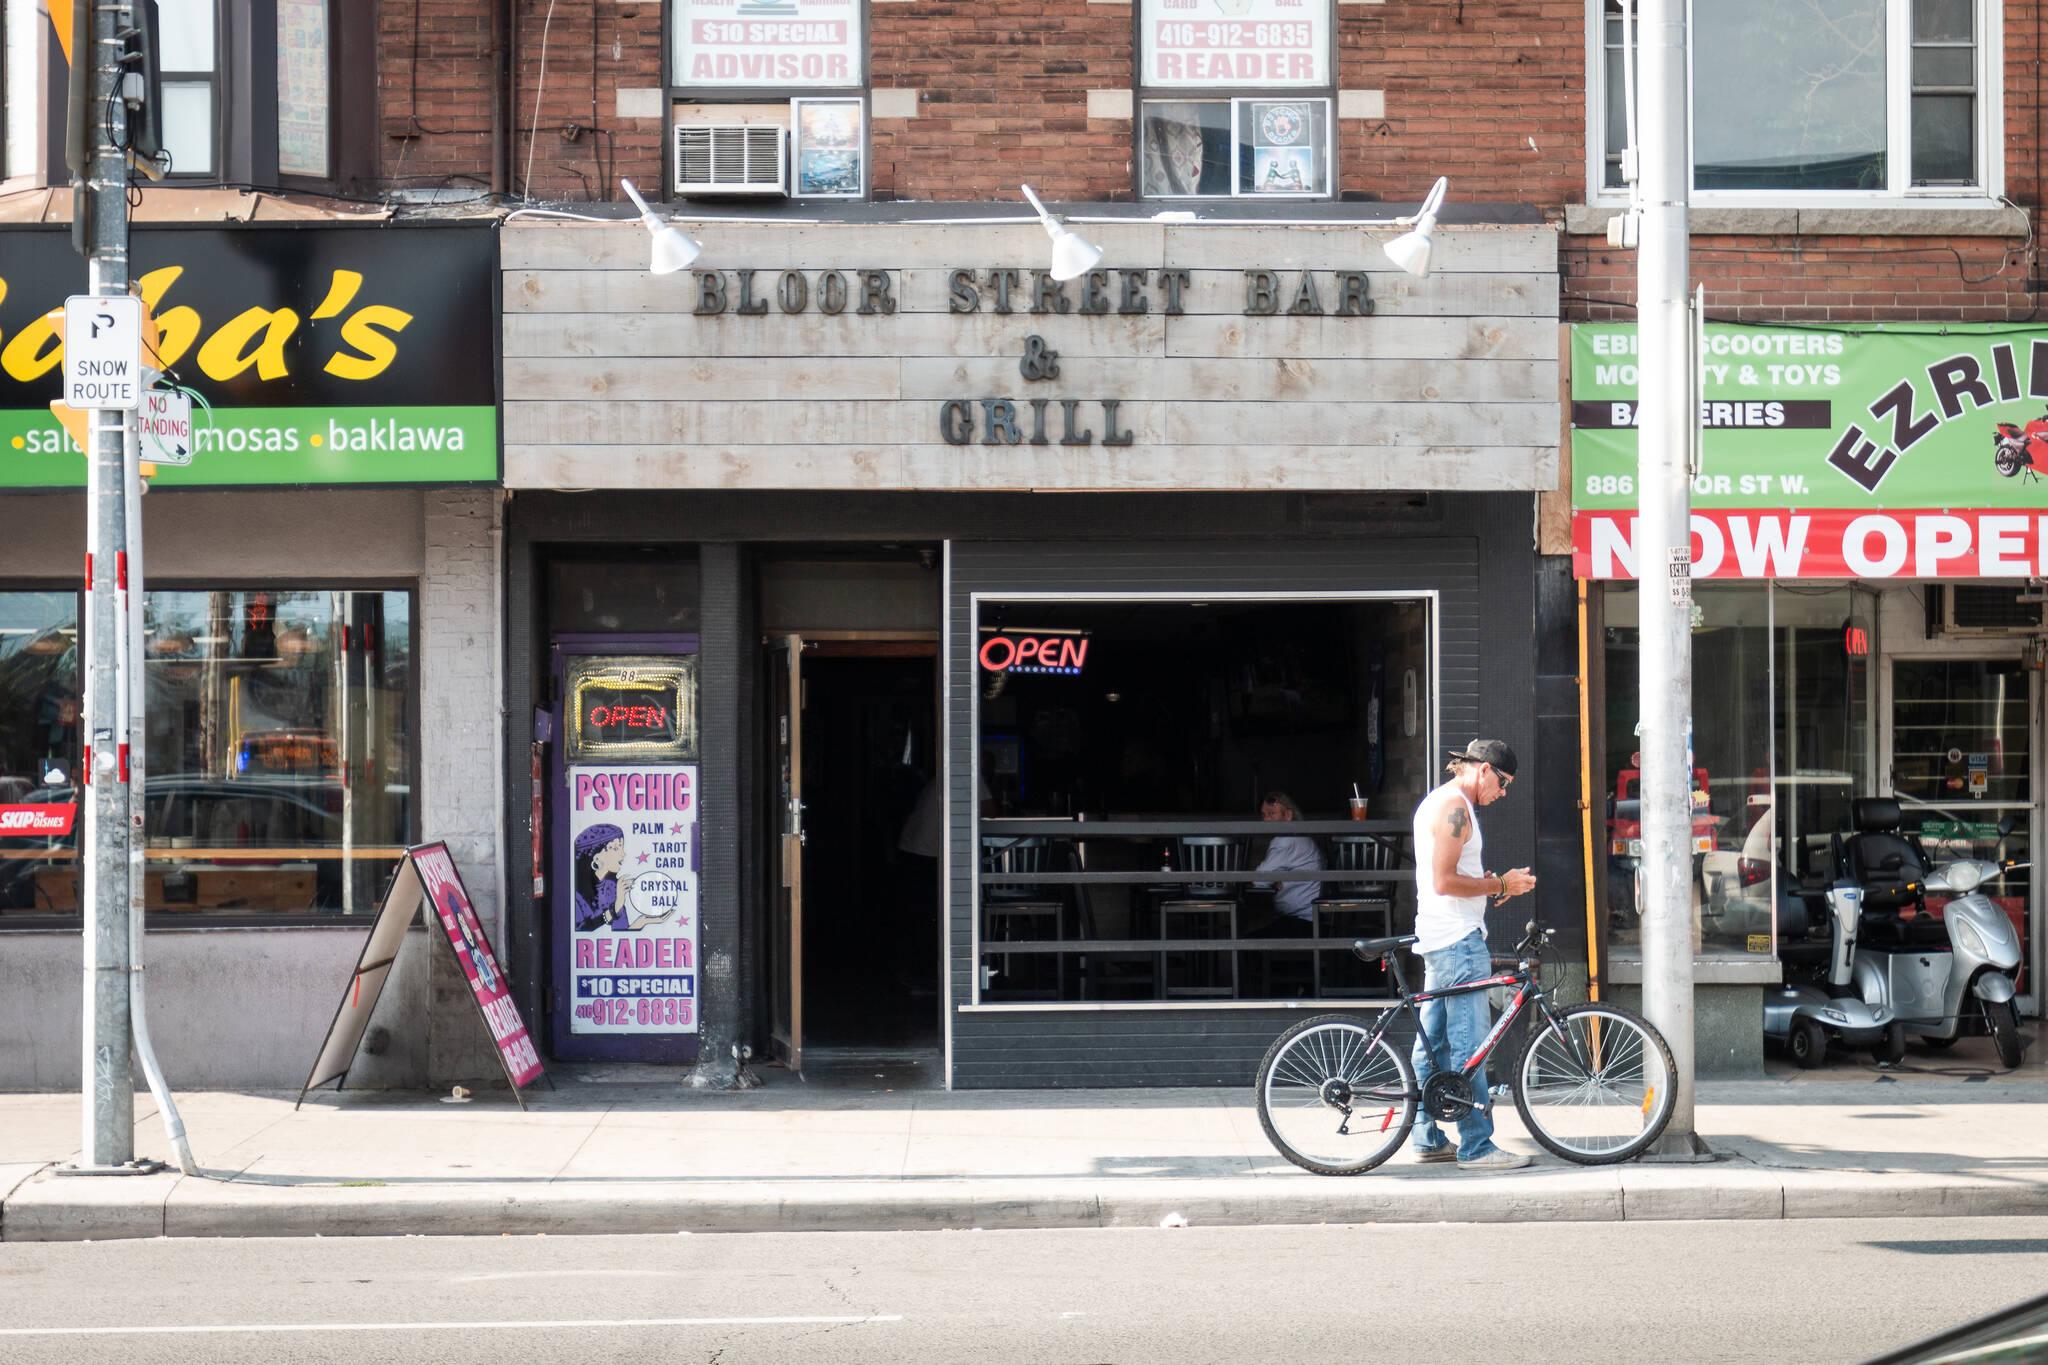 Bloor Street Bar Grill Toronto